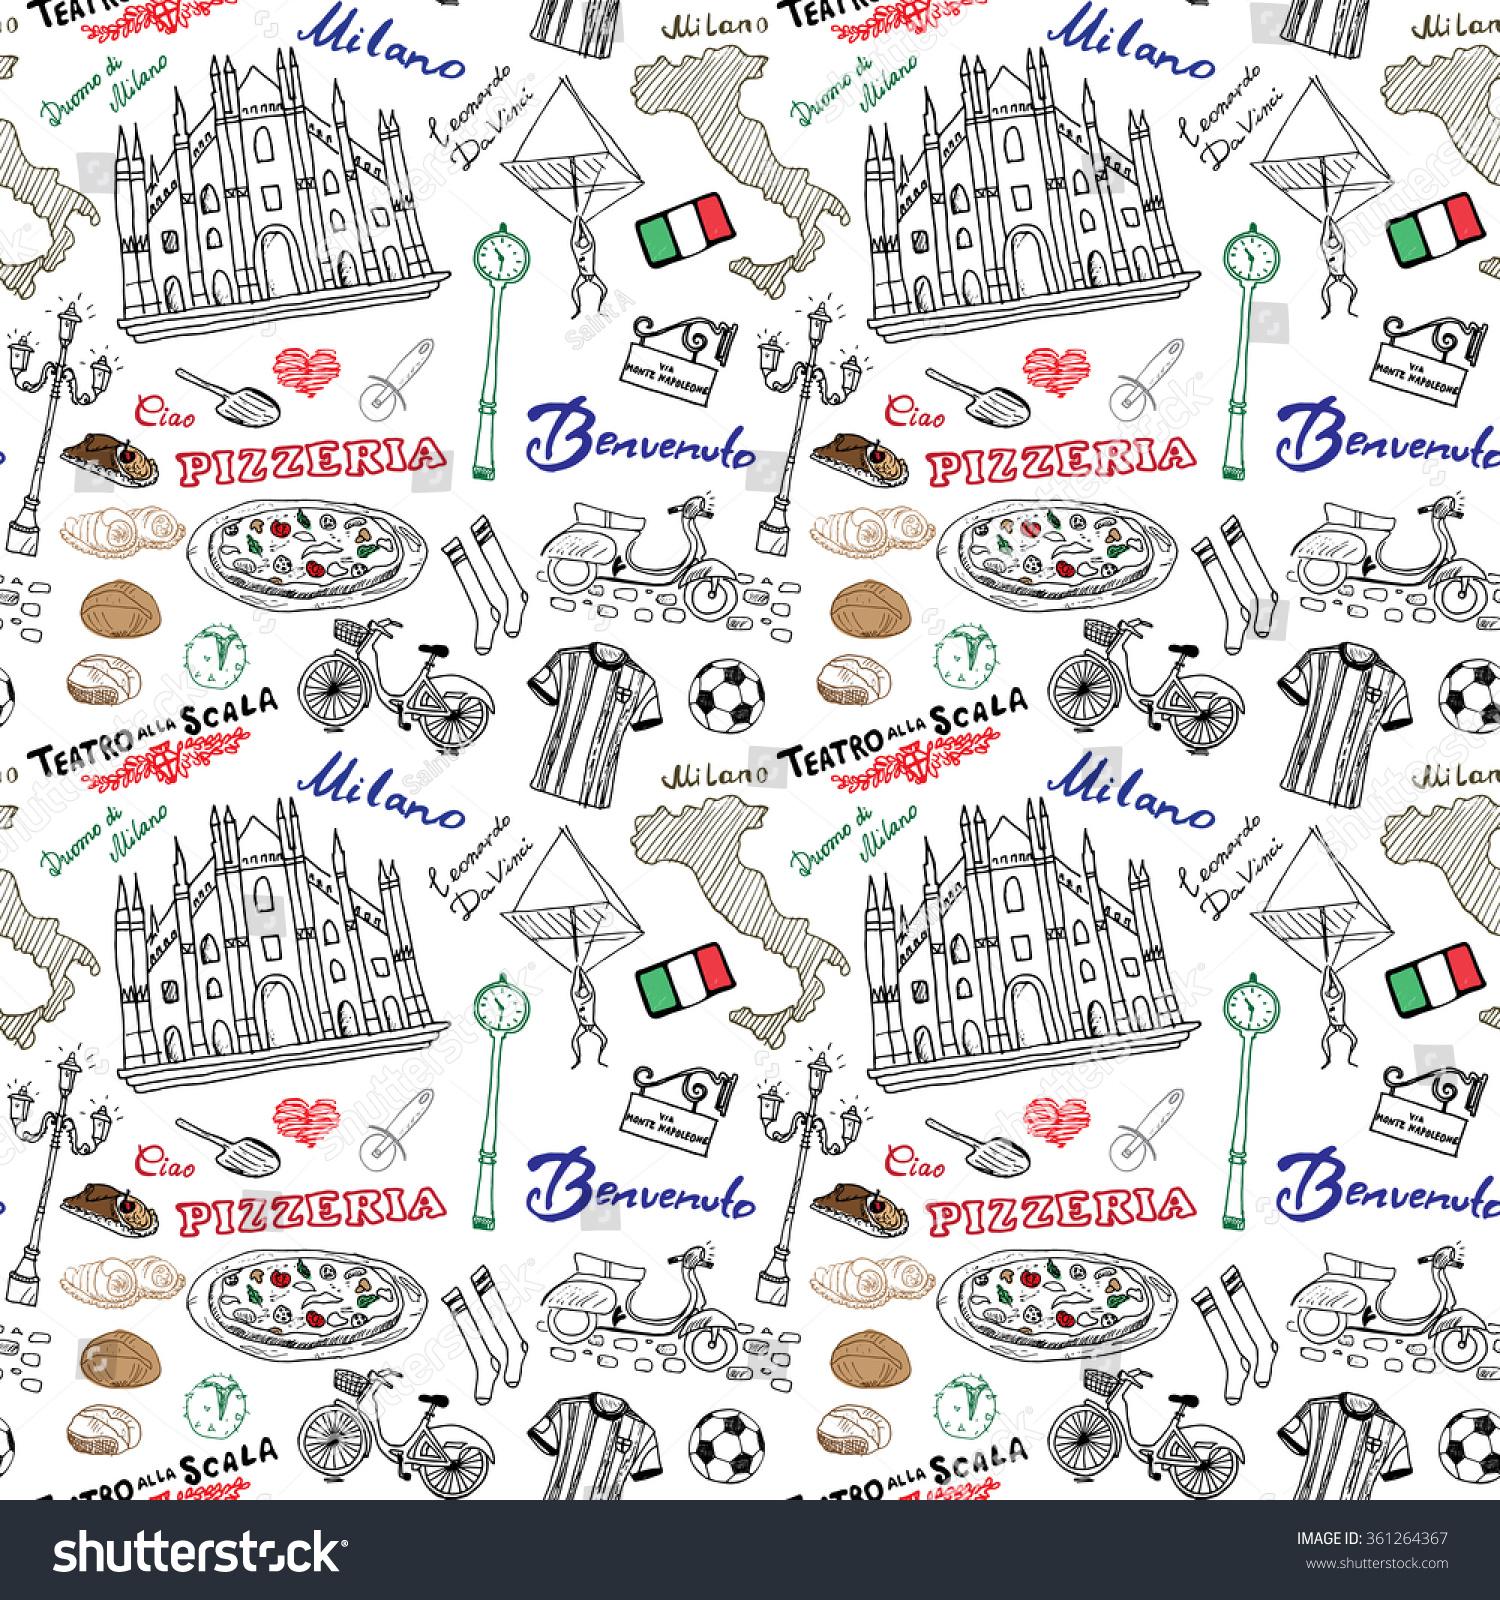 Milan Italy Seamless Pattern Hand Drawn Stock Vector HD Royalty